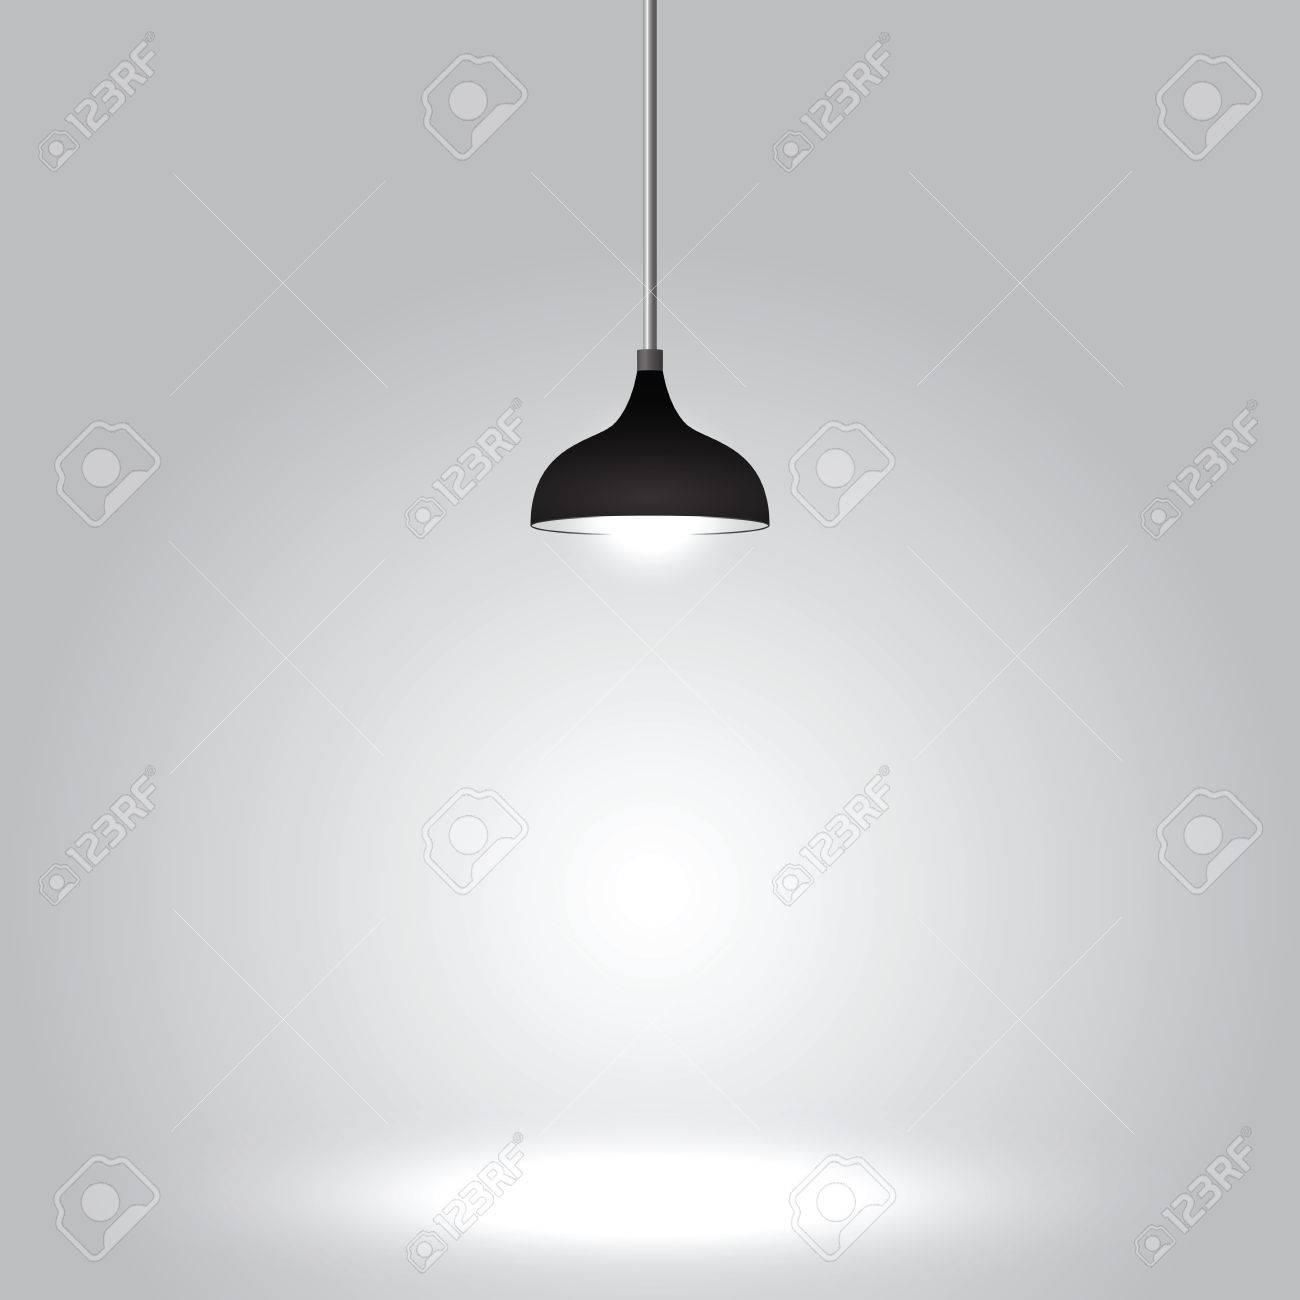 Black ceiling lamp on gray background, VECTOR, EPS10 - 35118480